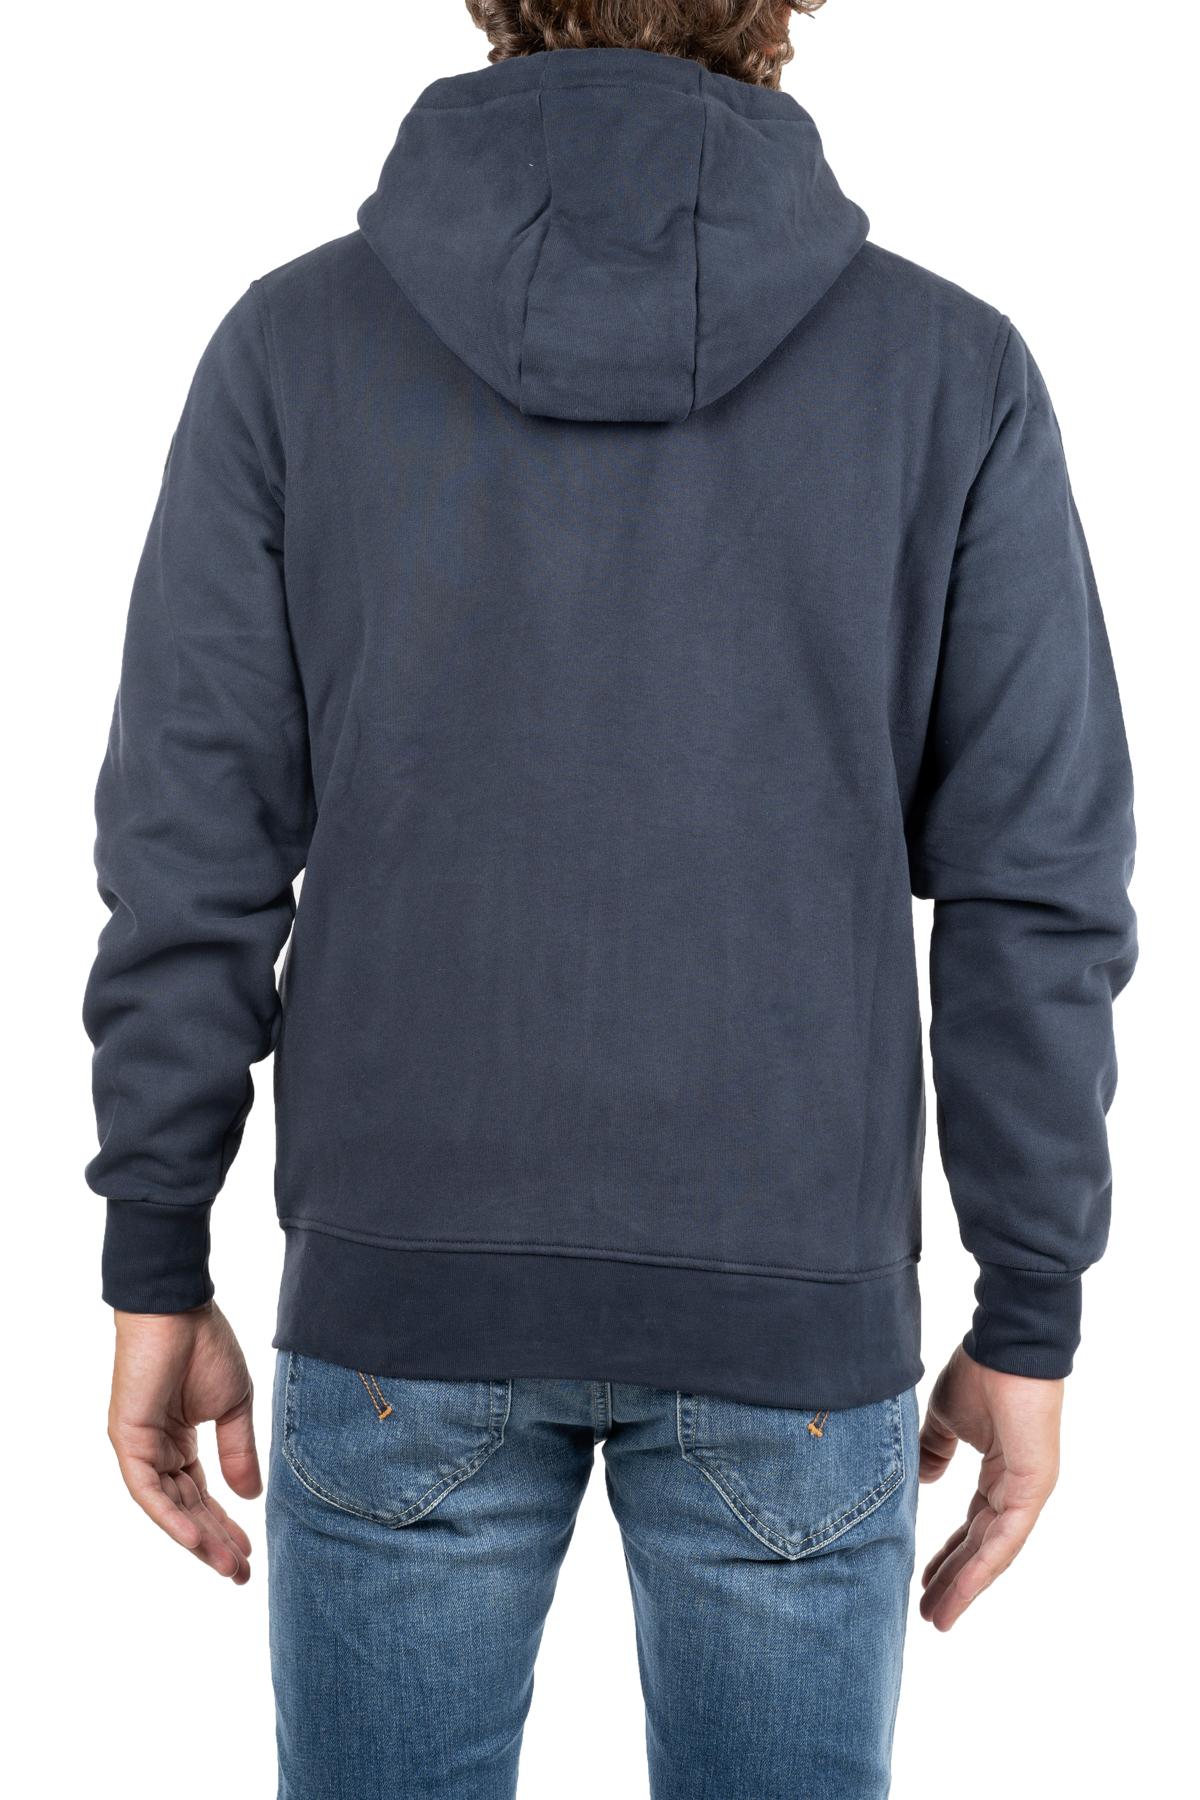 BLUE COTTON SWEATSHIRT WITH LOGO APPLICATION COLMAR | Sweatshirts | 8270SOUNDS9RR68